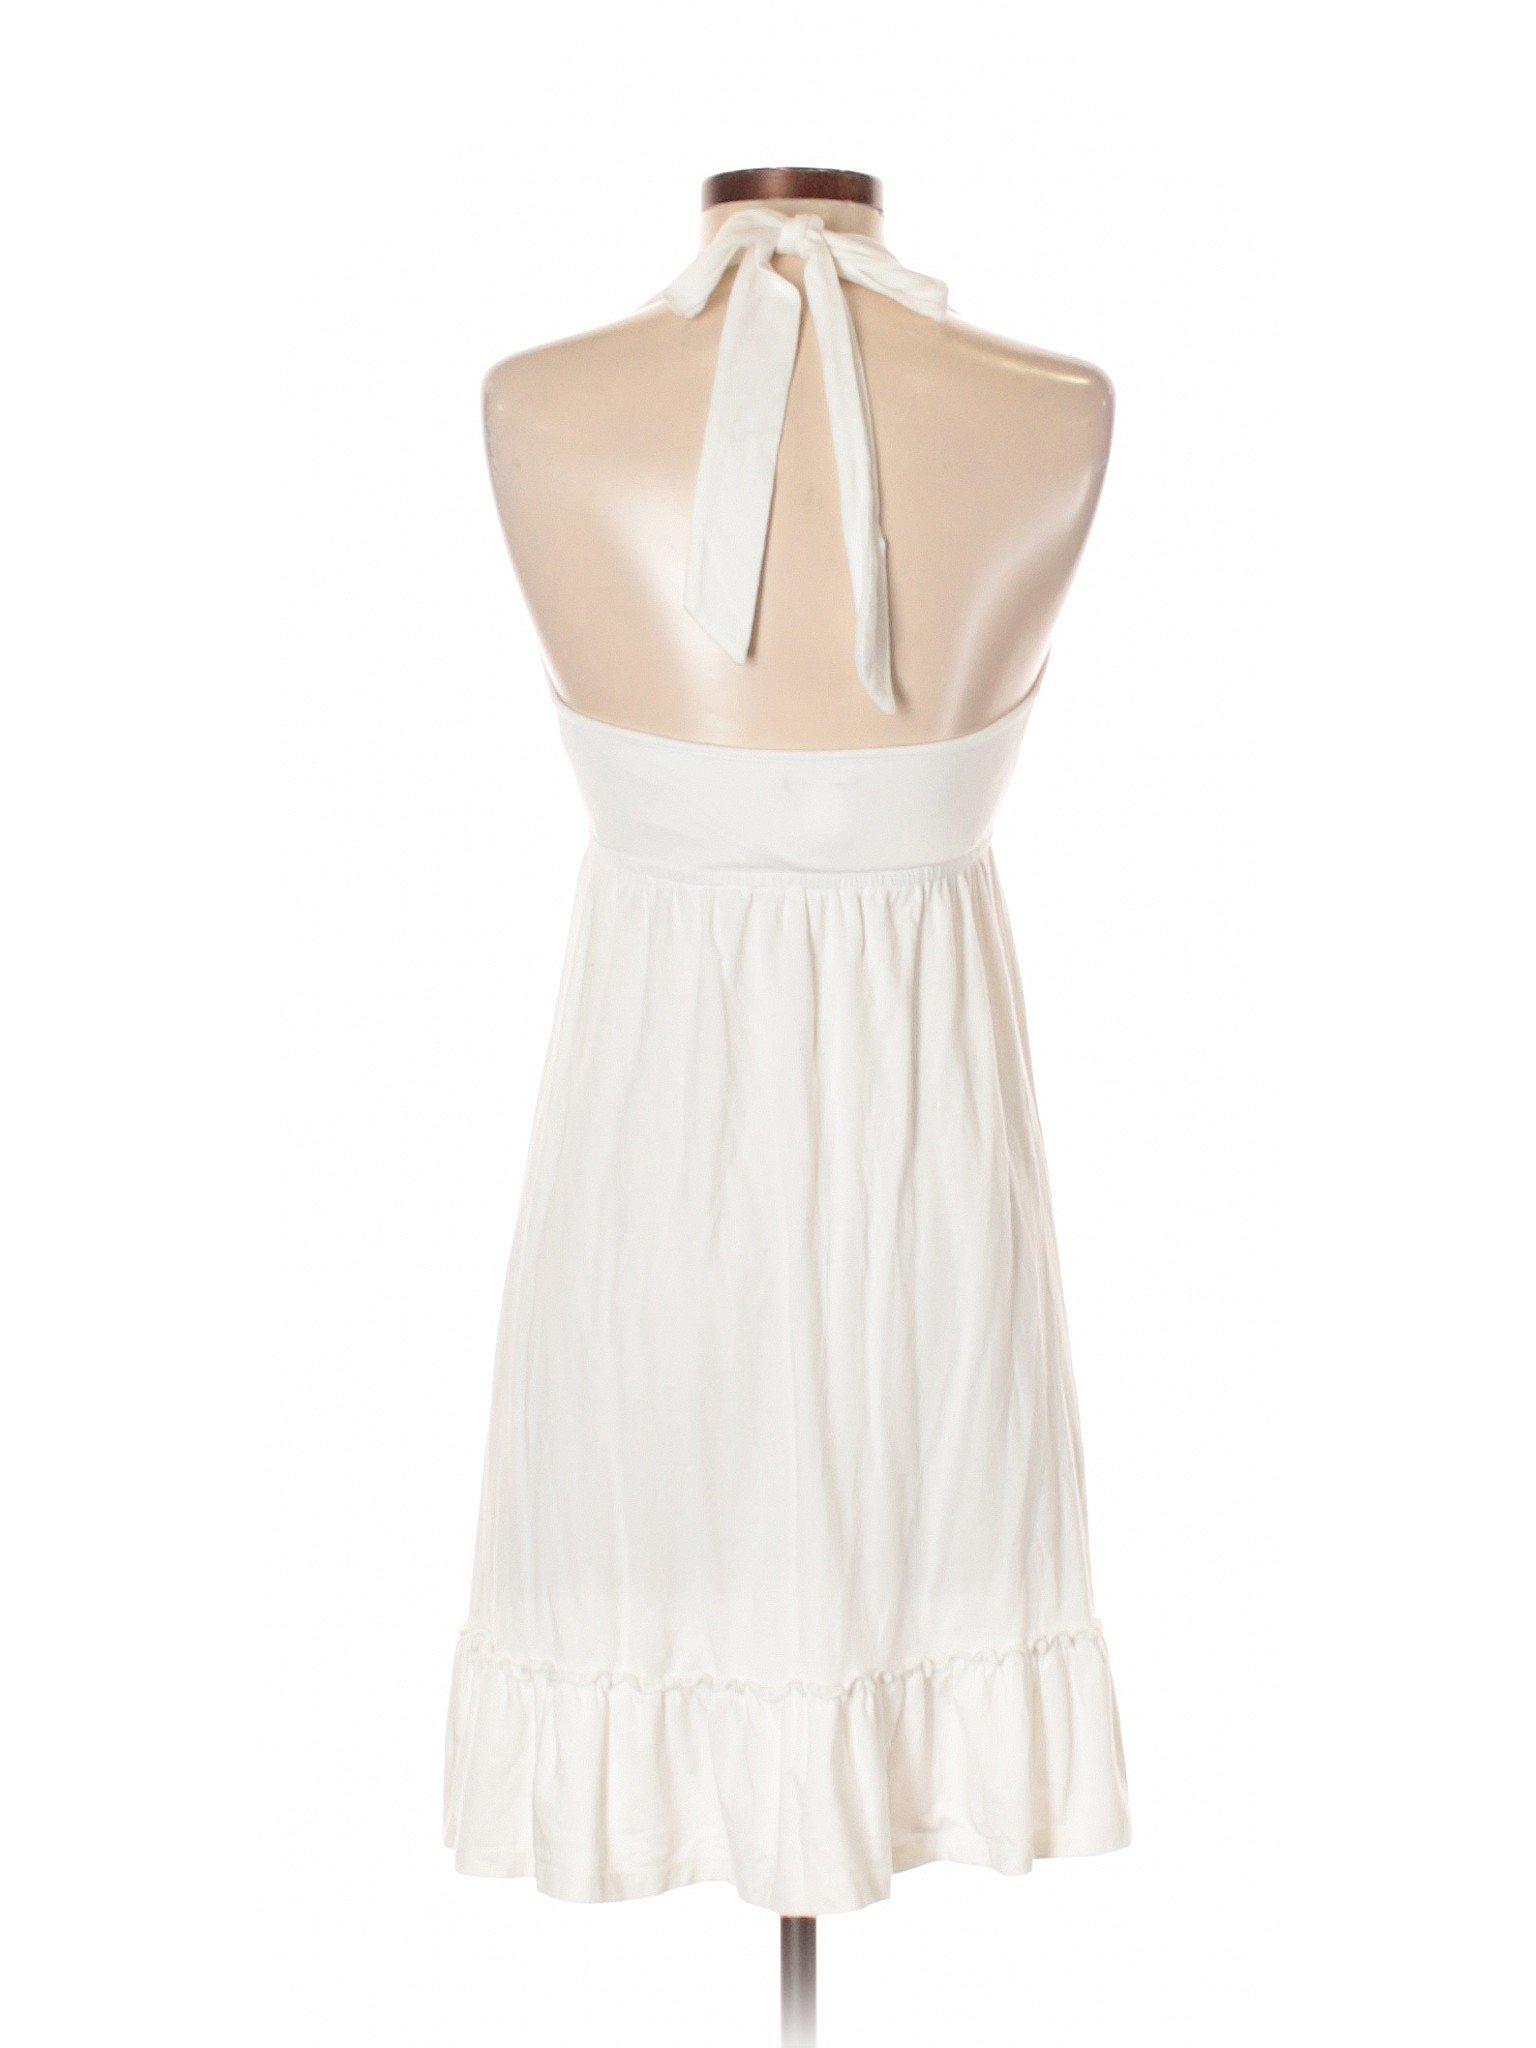 Dress Casual Selling Selling International Moda Moda W8Xw11Unq